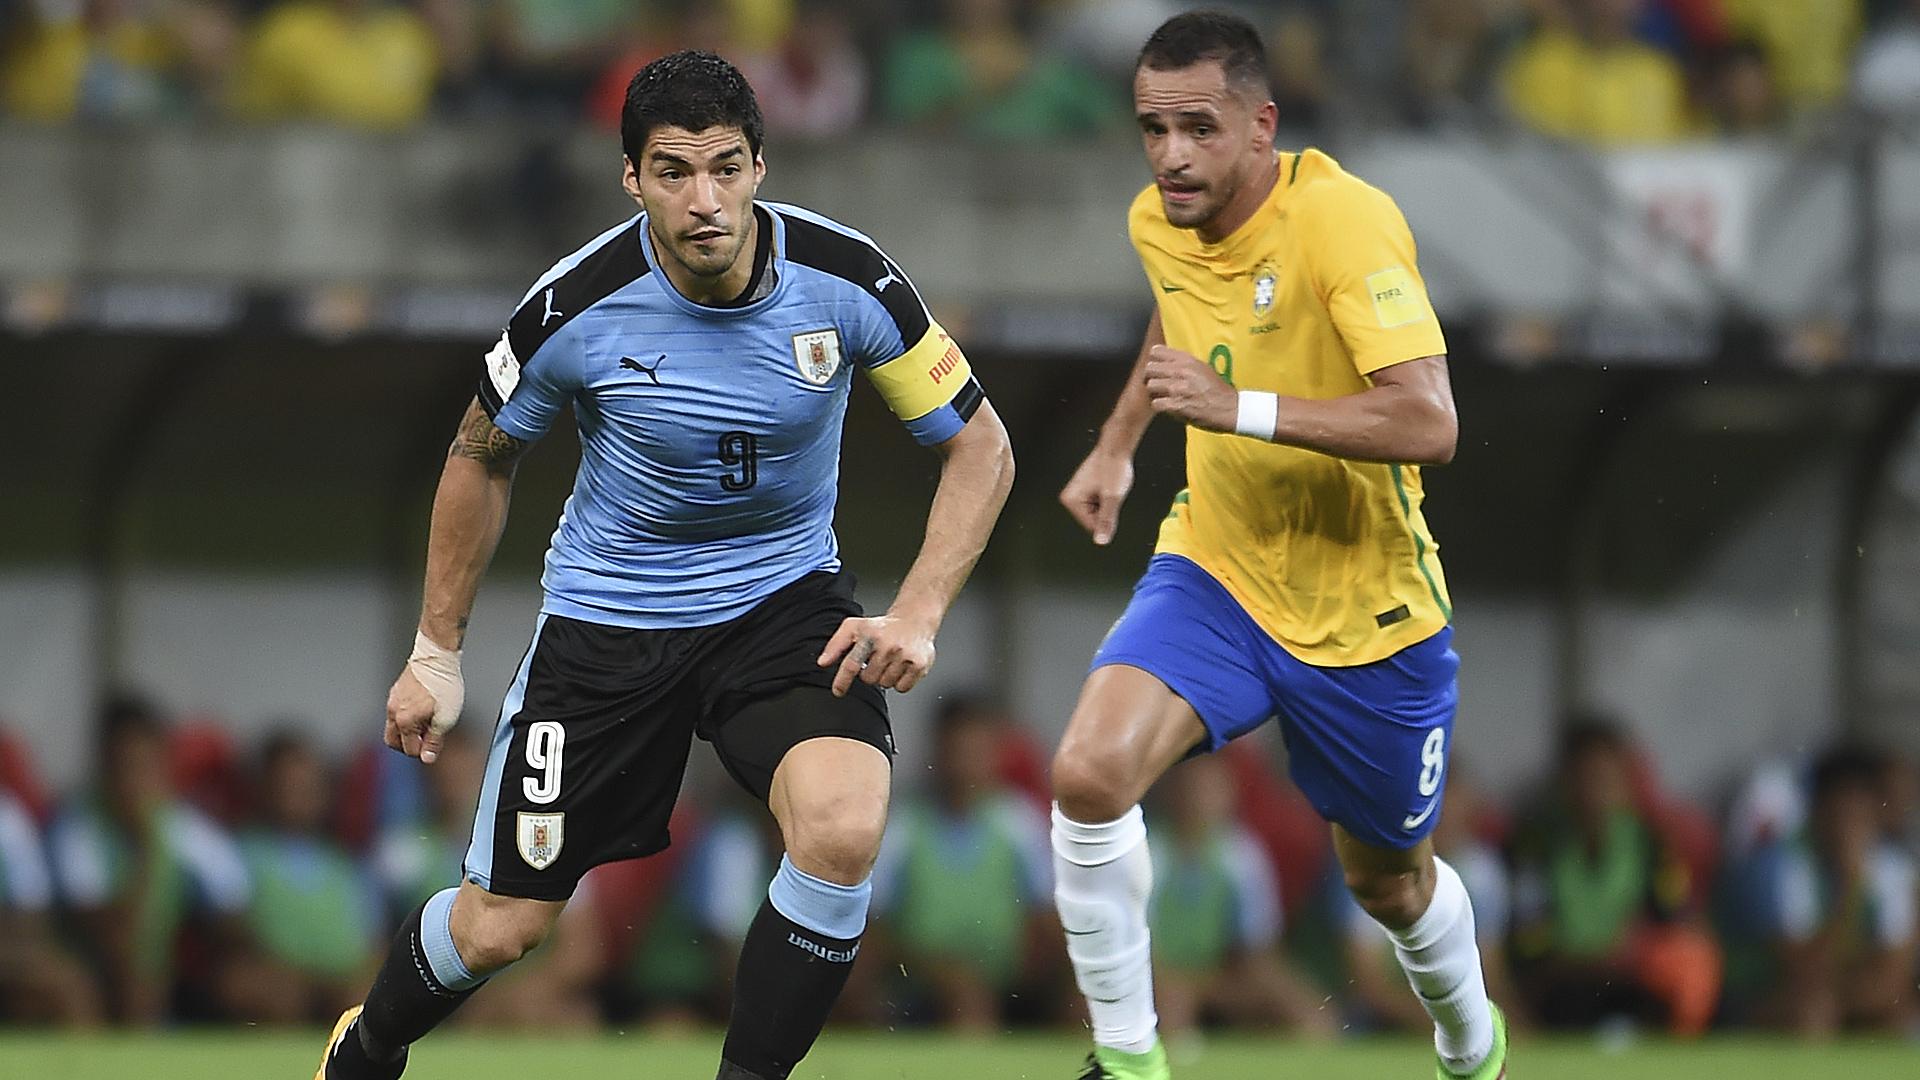 Luis Suarez Brazil Uruguay 03252016